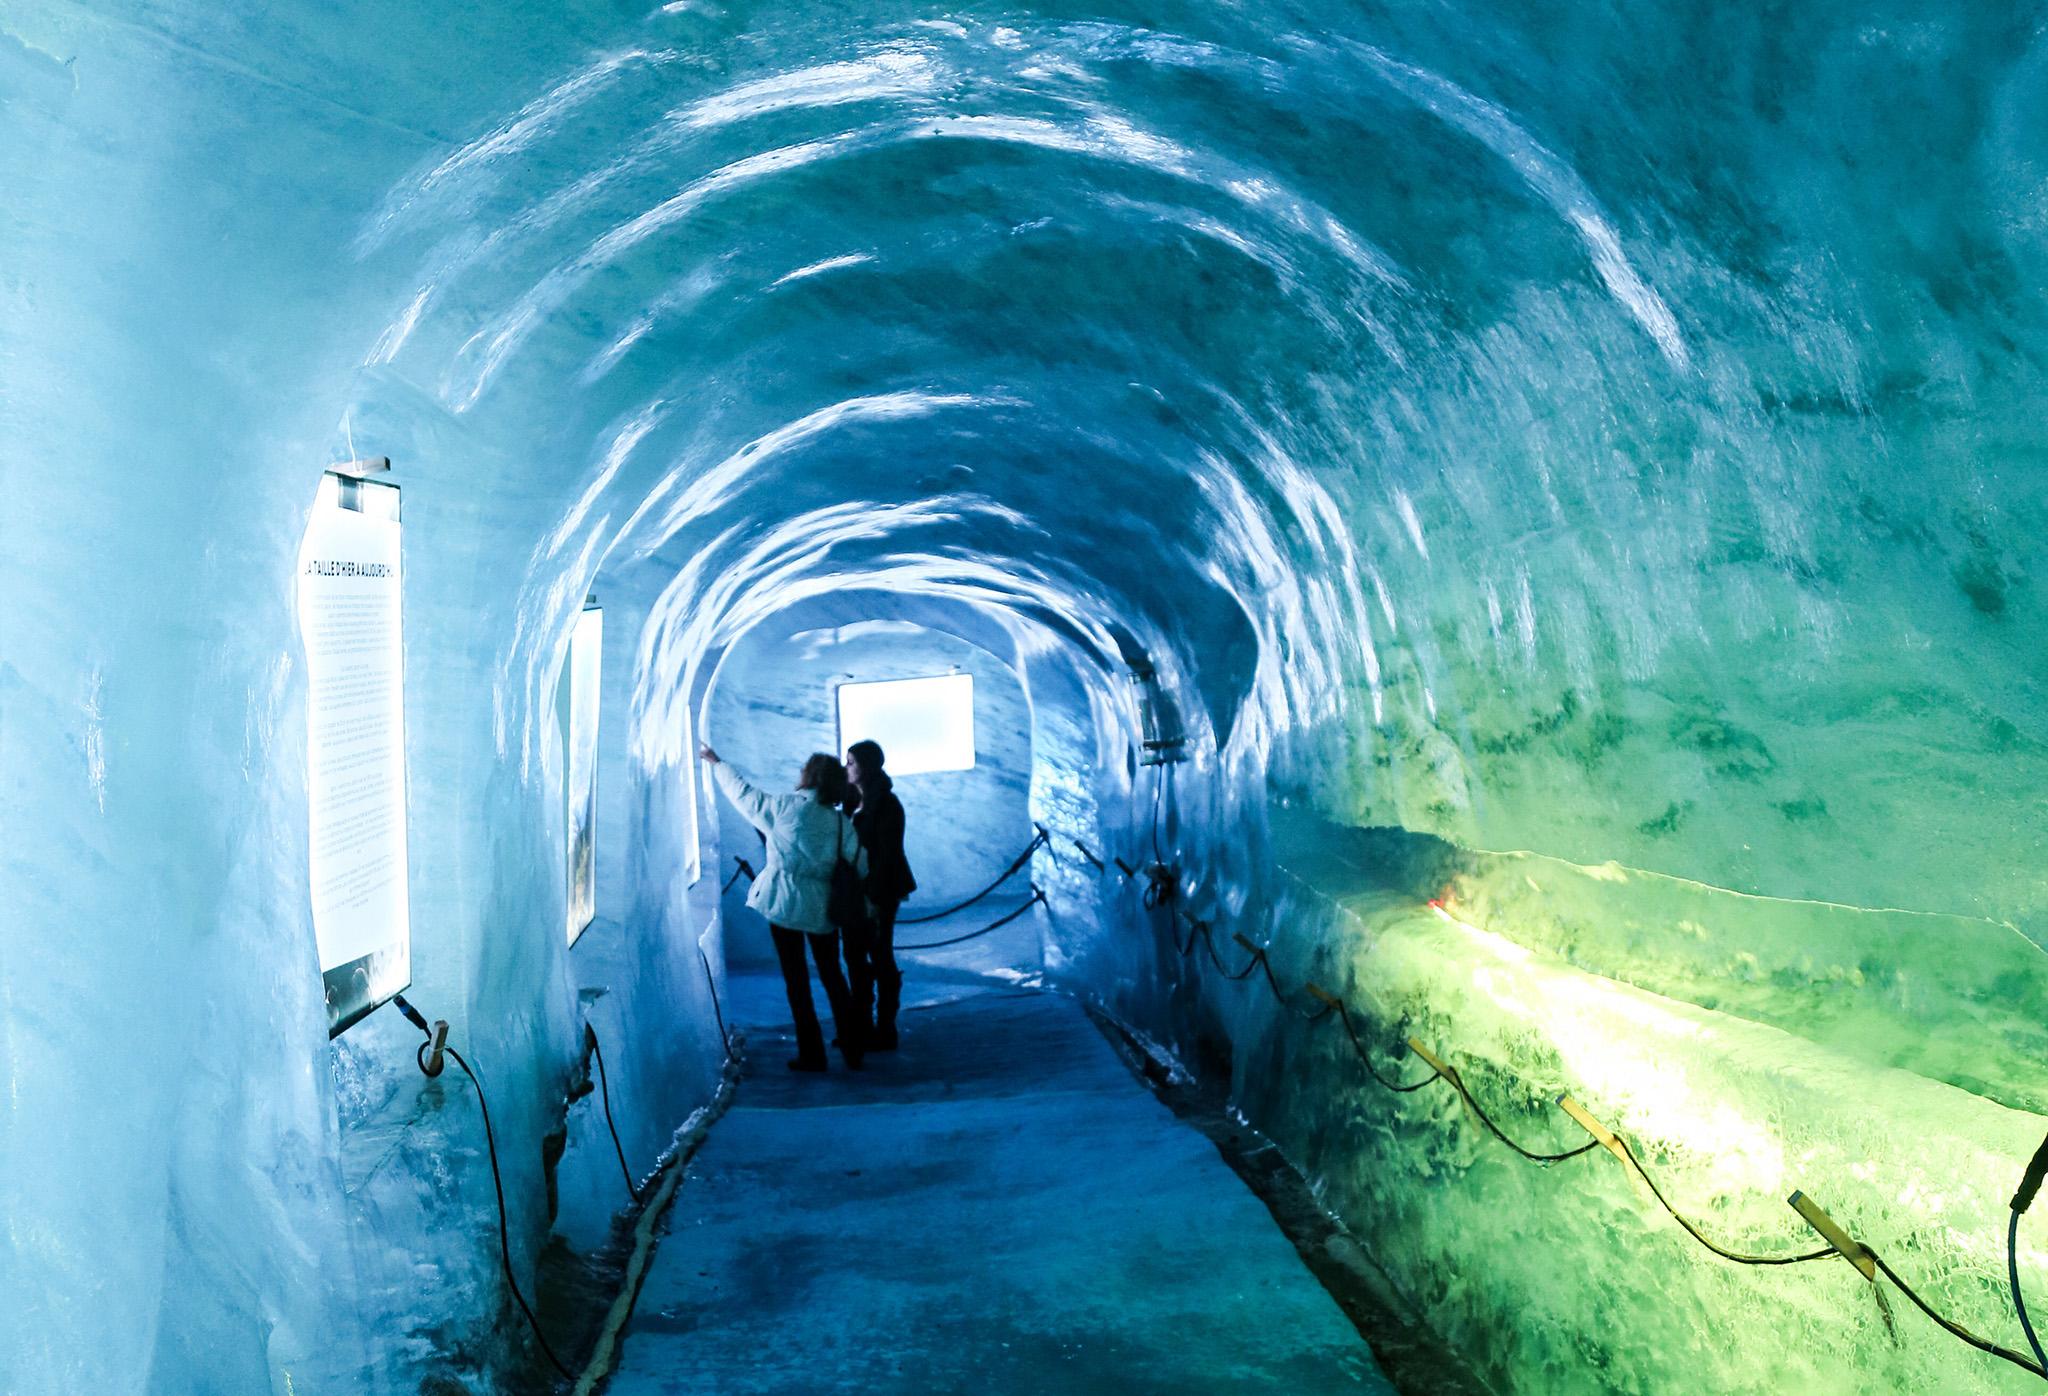 kt_2020_100_keytours_excursions_swisstours_chamonix_mont-blanc_mer_de_glace1_2048_10